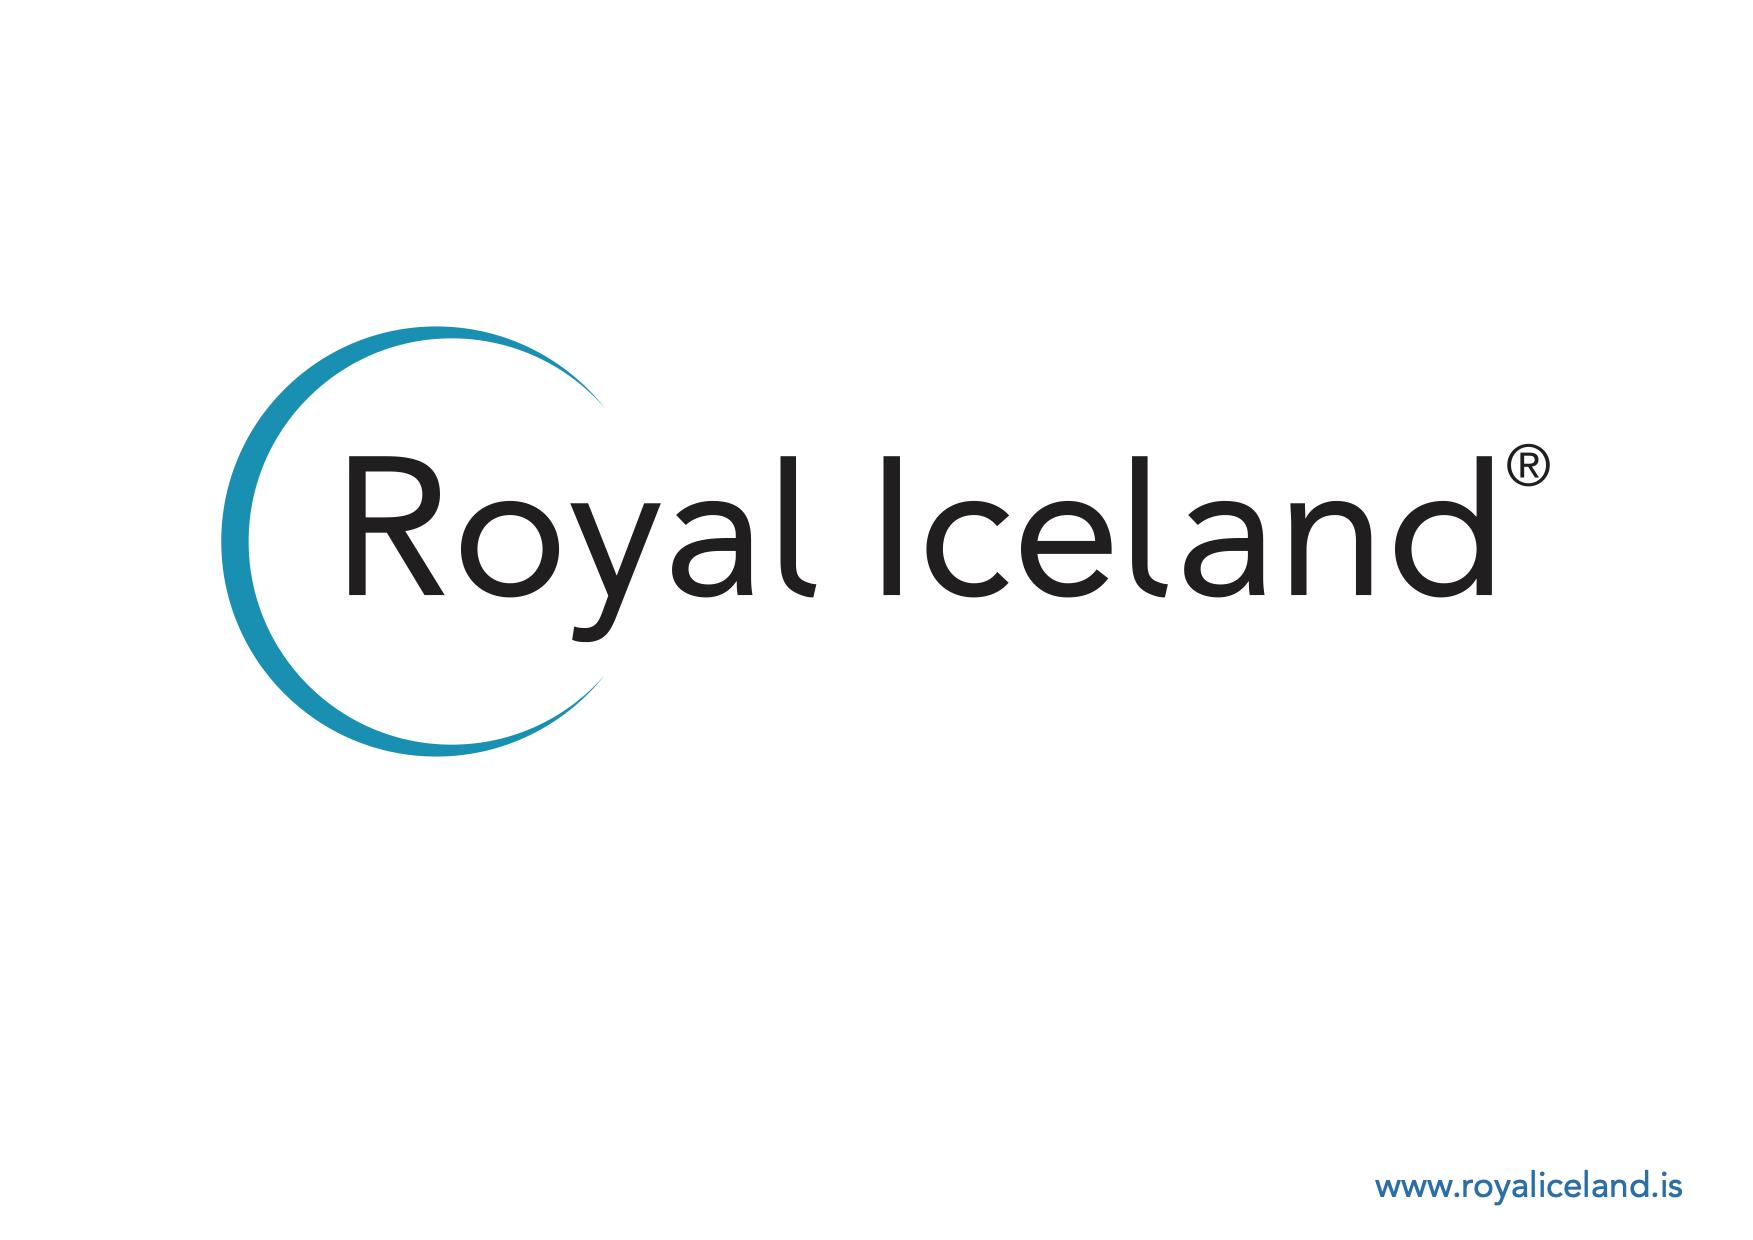 RI Royal Iceland logo